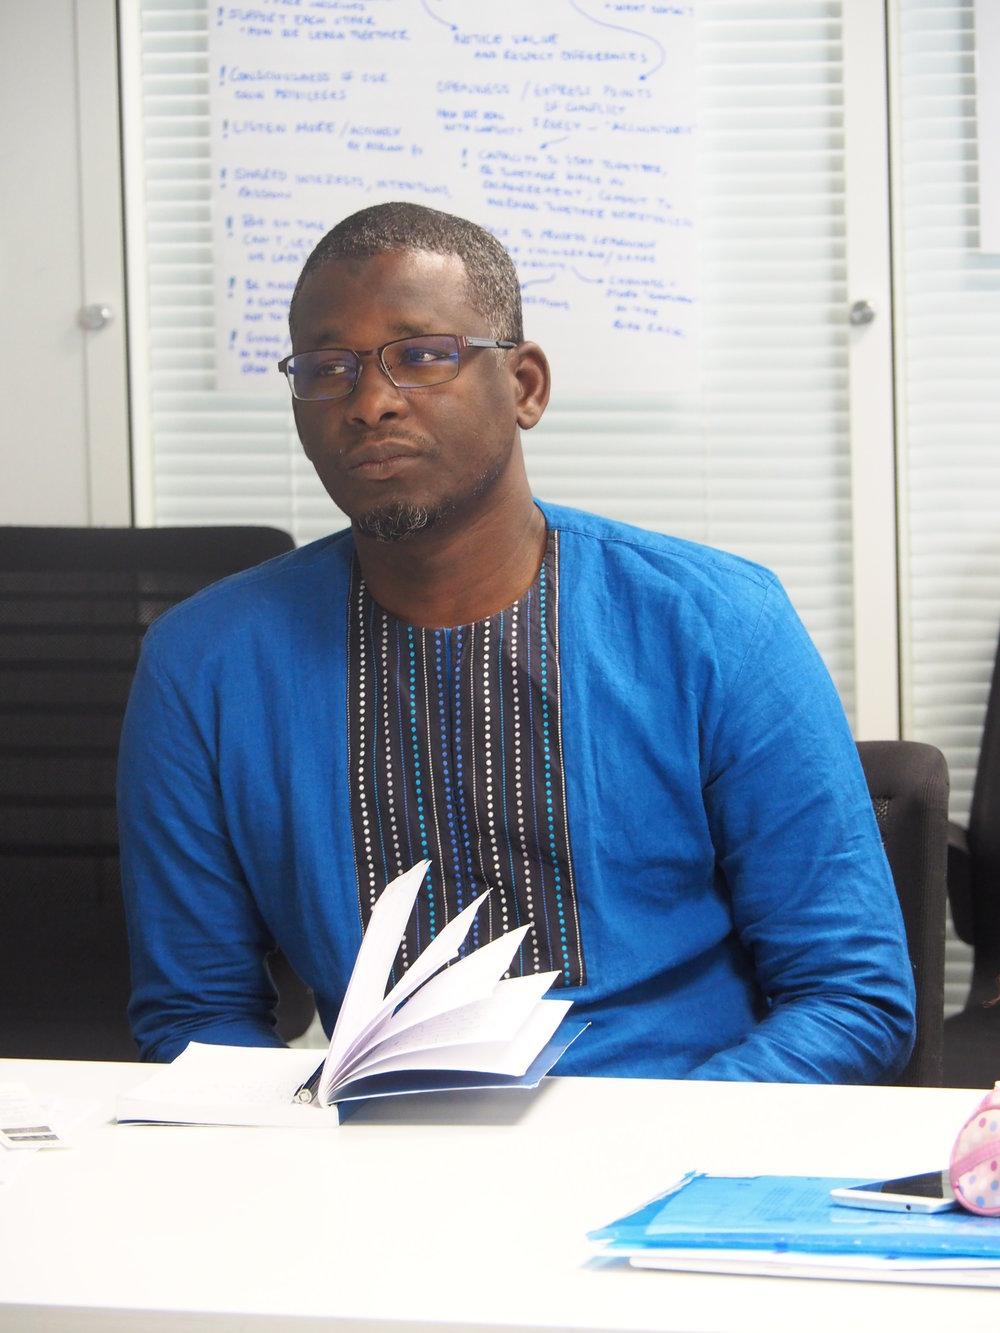 Elimane Kane - 2018-19 Atlantic Fellow for Social and Economic Equity